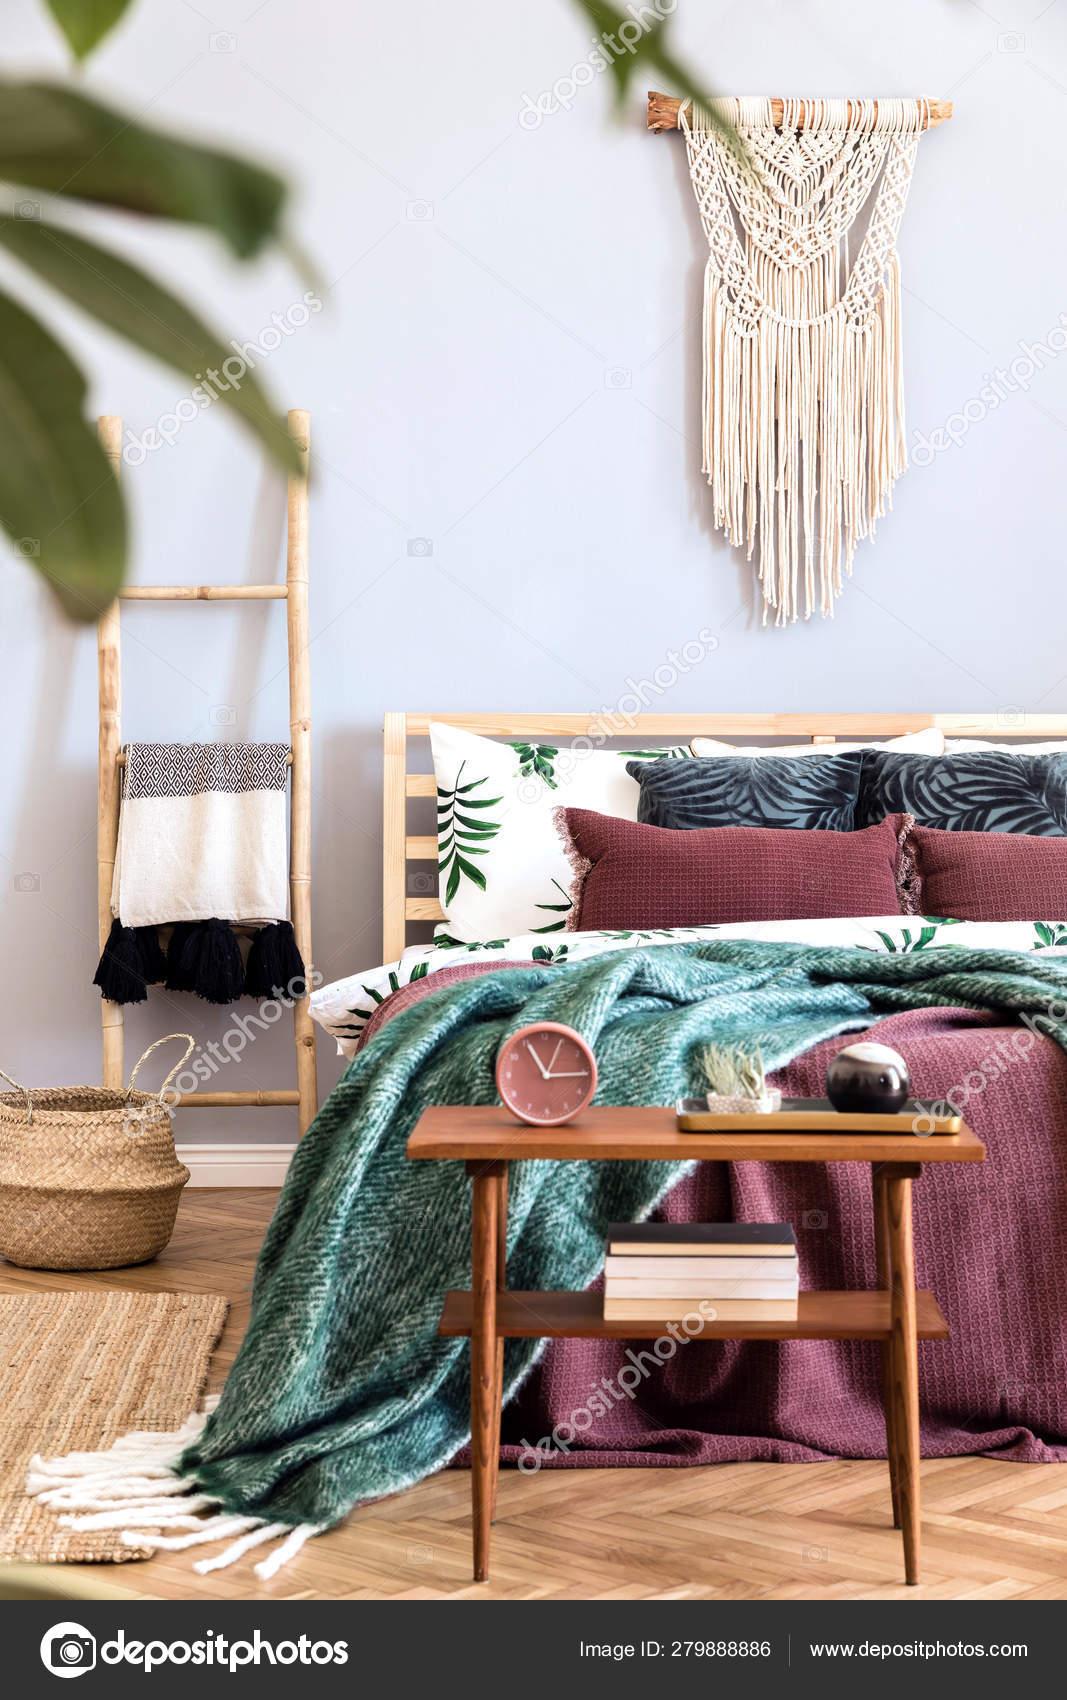 Modern Luxury Interior Bedroom Design Furnitures Stylish Macrame Wooden Ladder Stock Photo Image By C Followtheflow 279888886